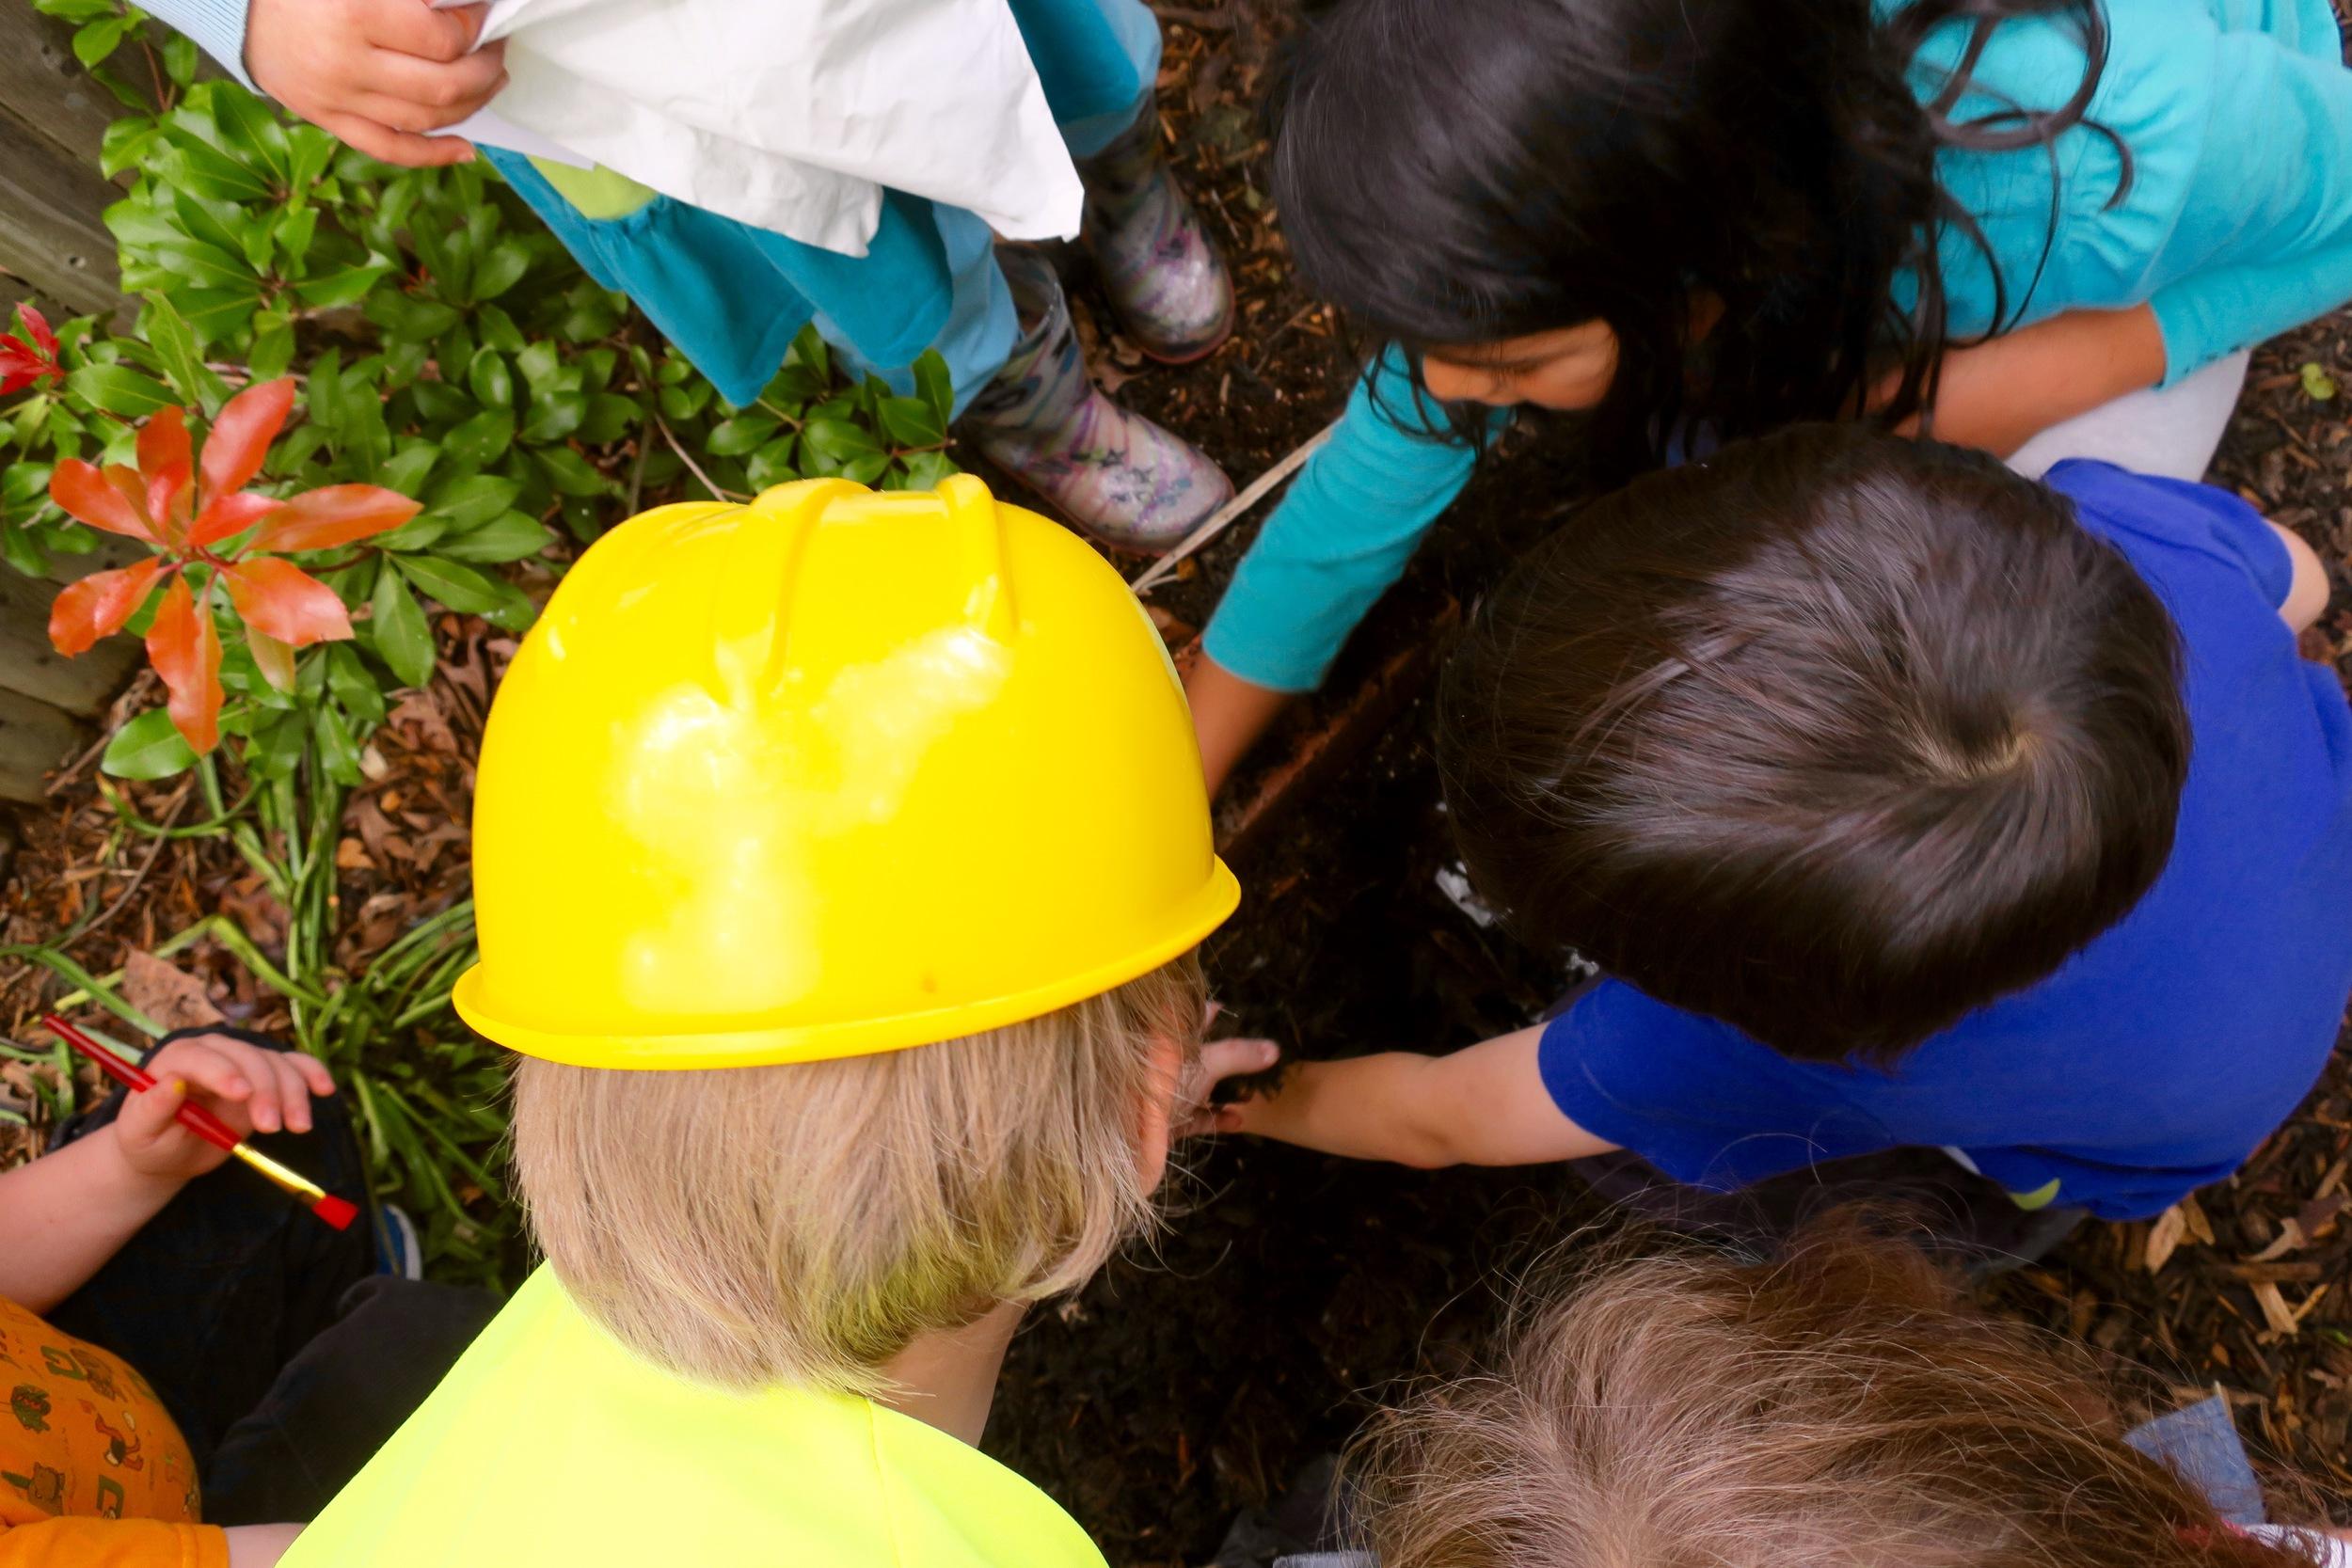 The children bury the shrew.